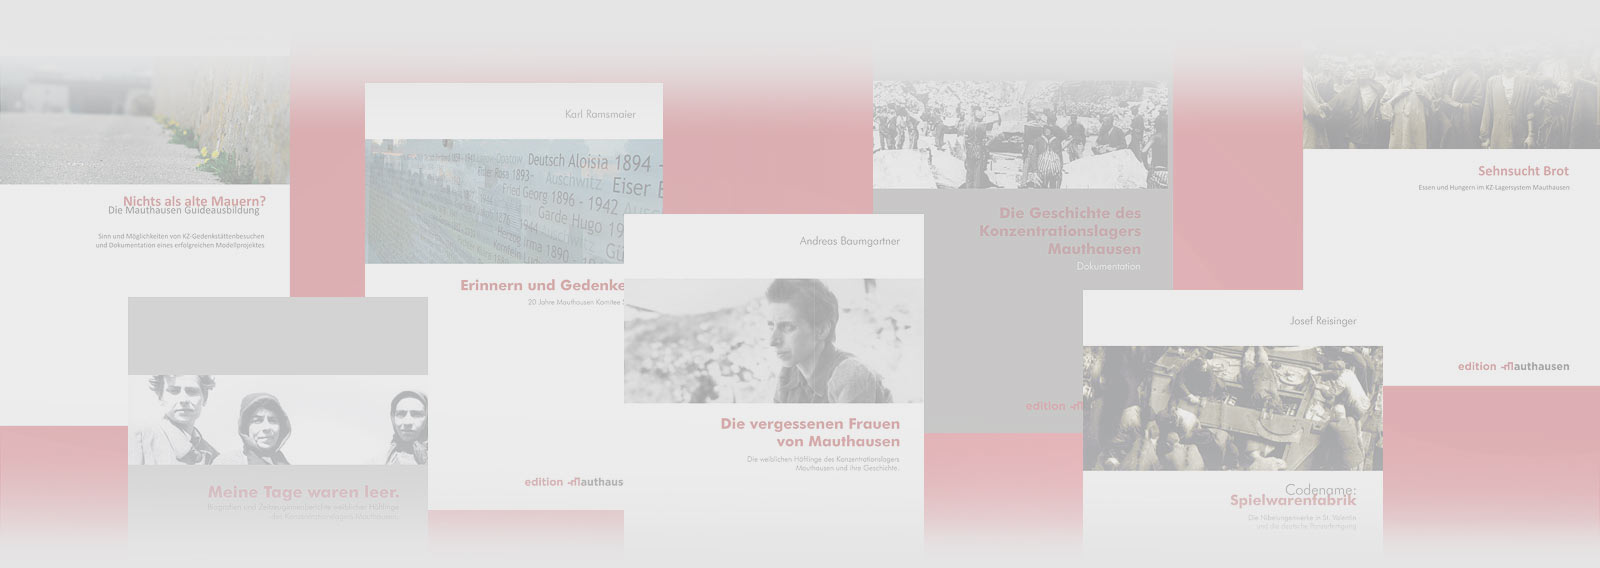 Er sucht Ihn (Erotik): Sex in Mauthausen - rematesbancarios.com